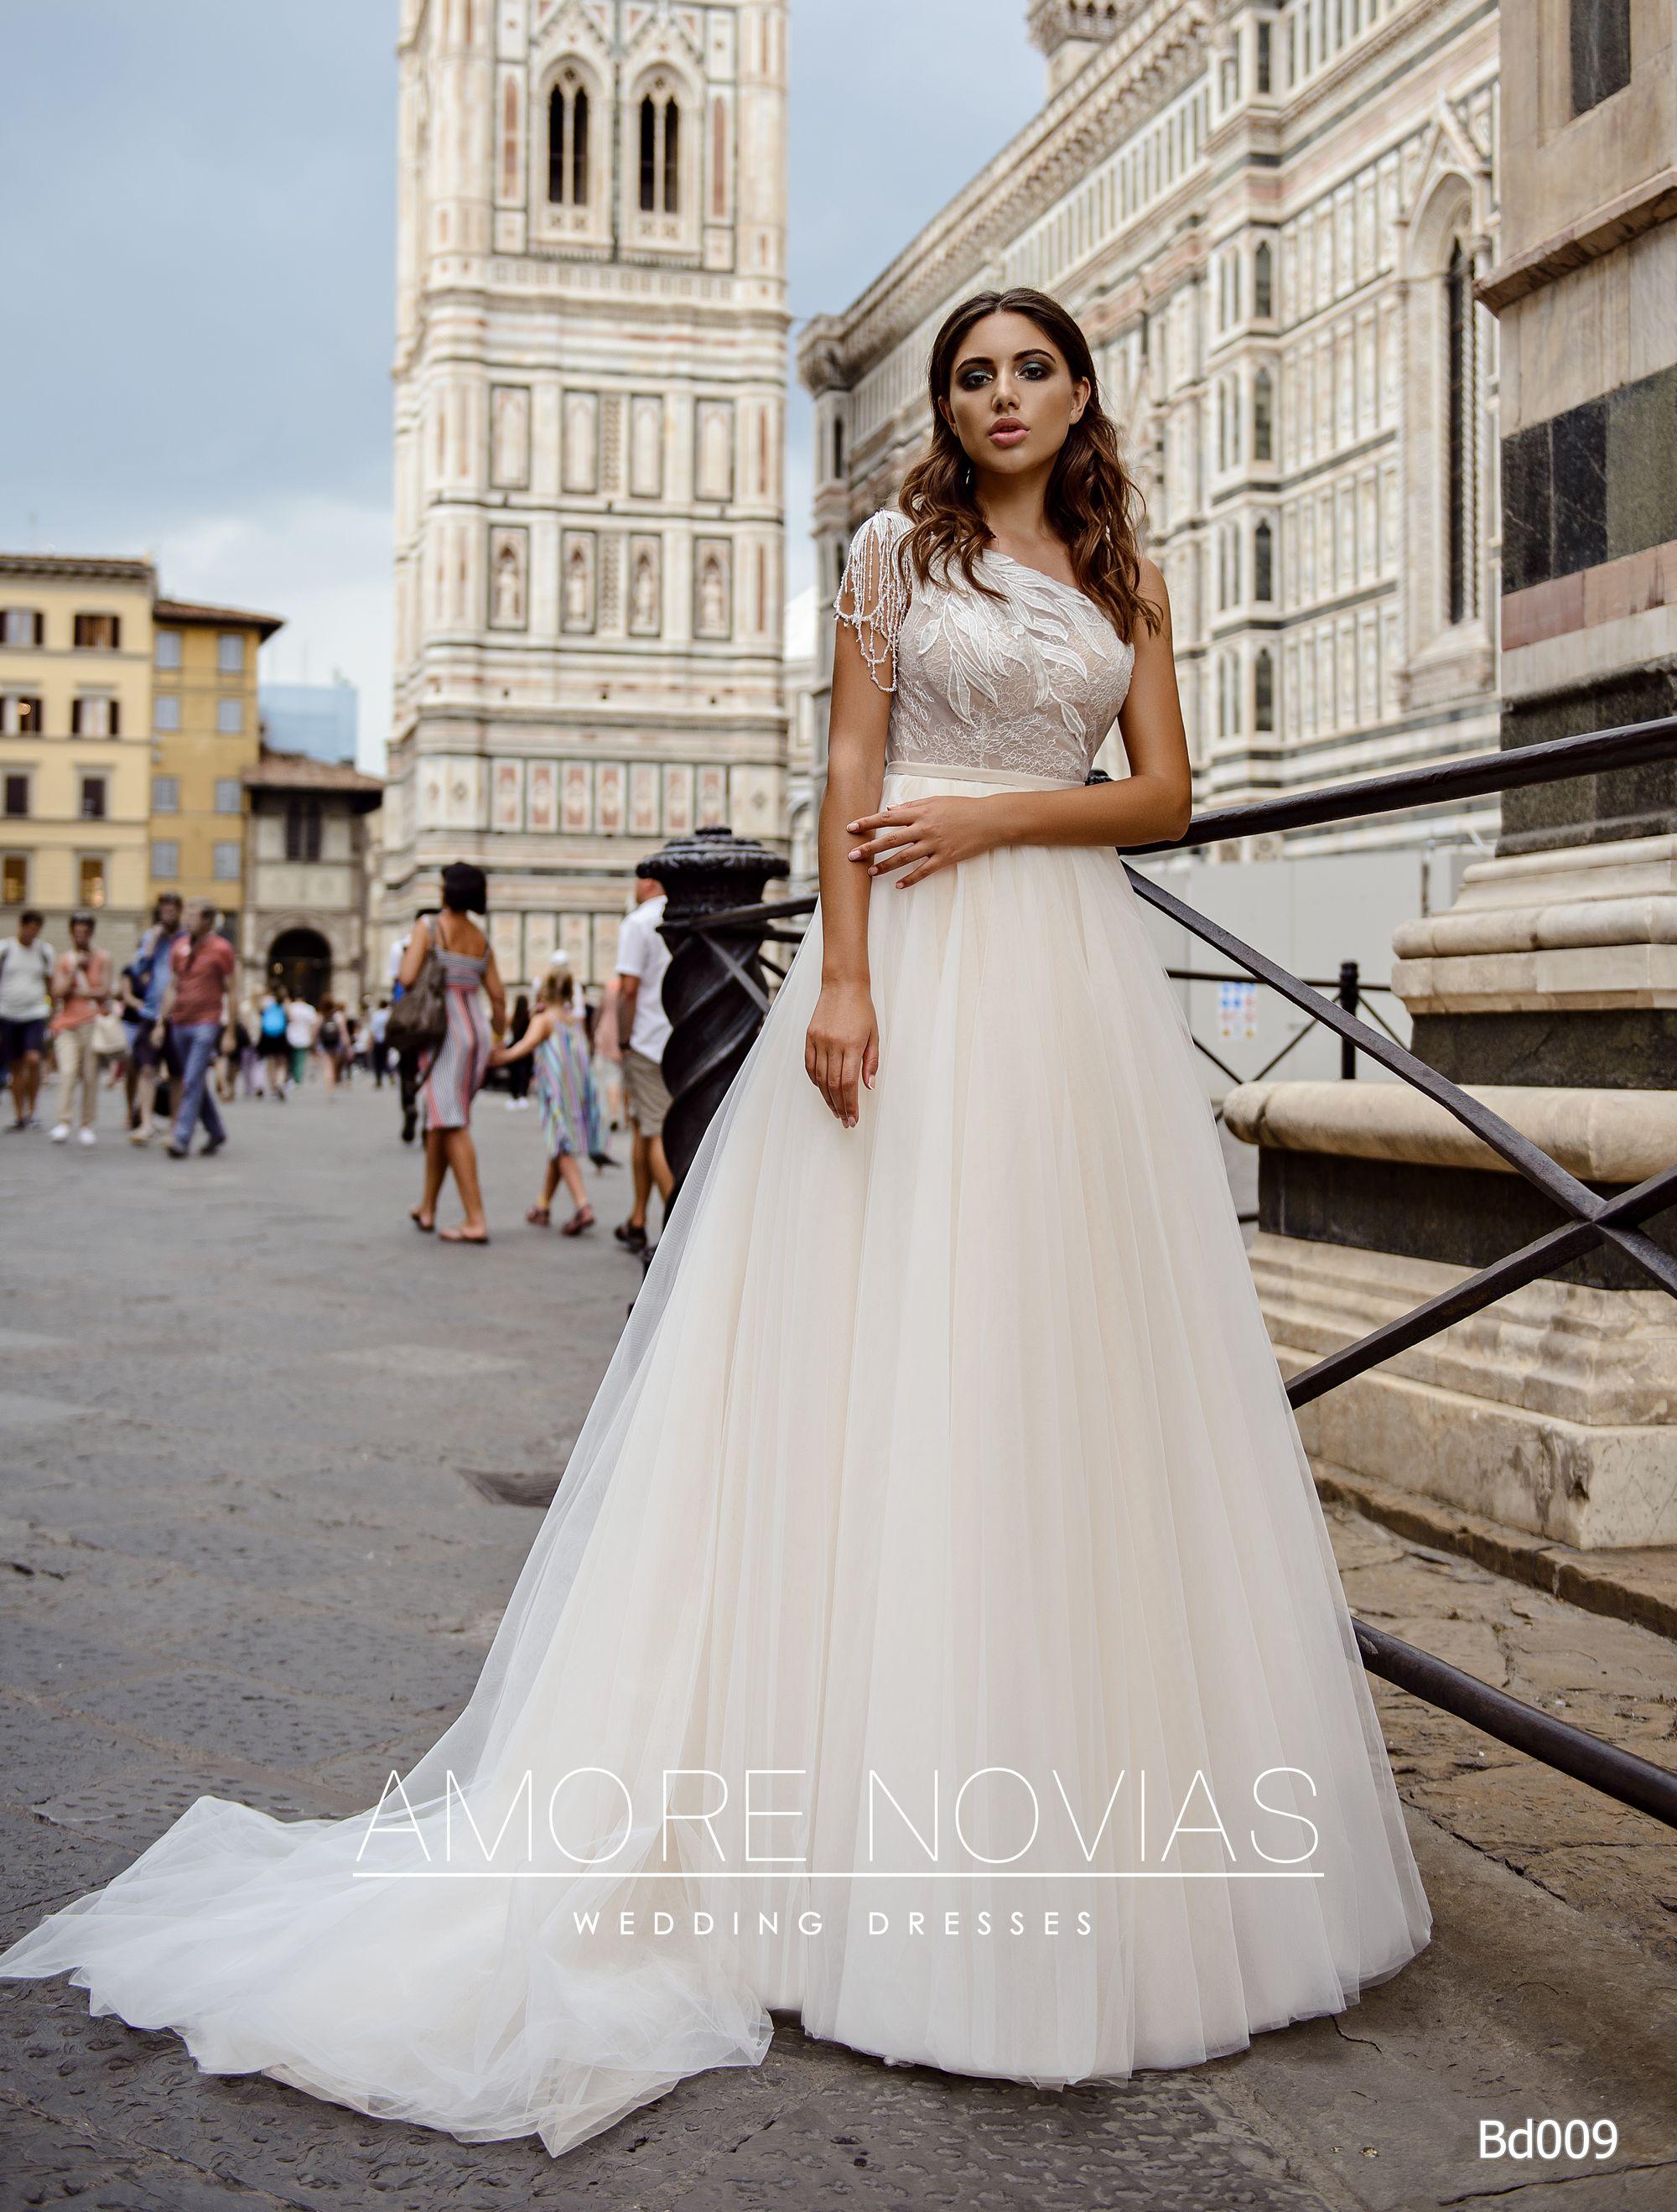 http://amore-novias.com/images/stories/virtuemart/product/bd009-------(1).jpg